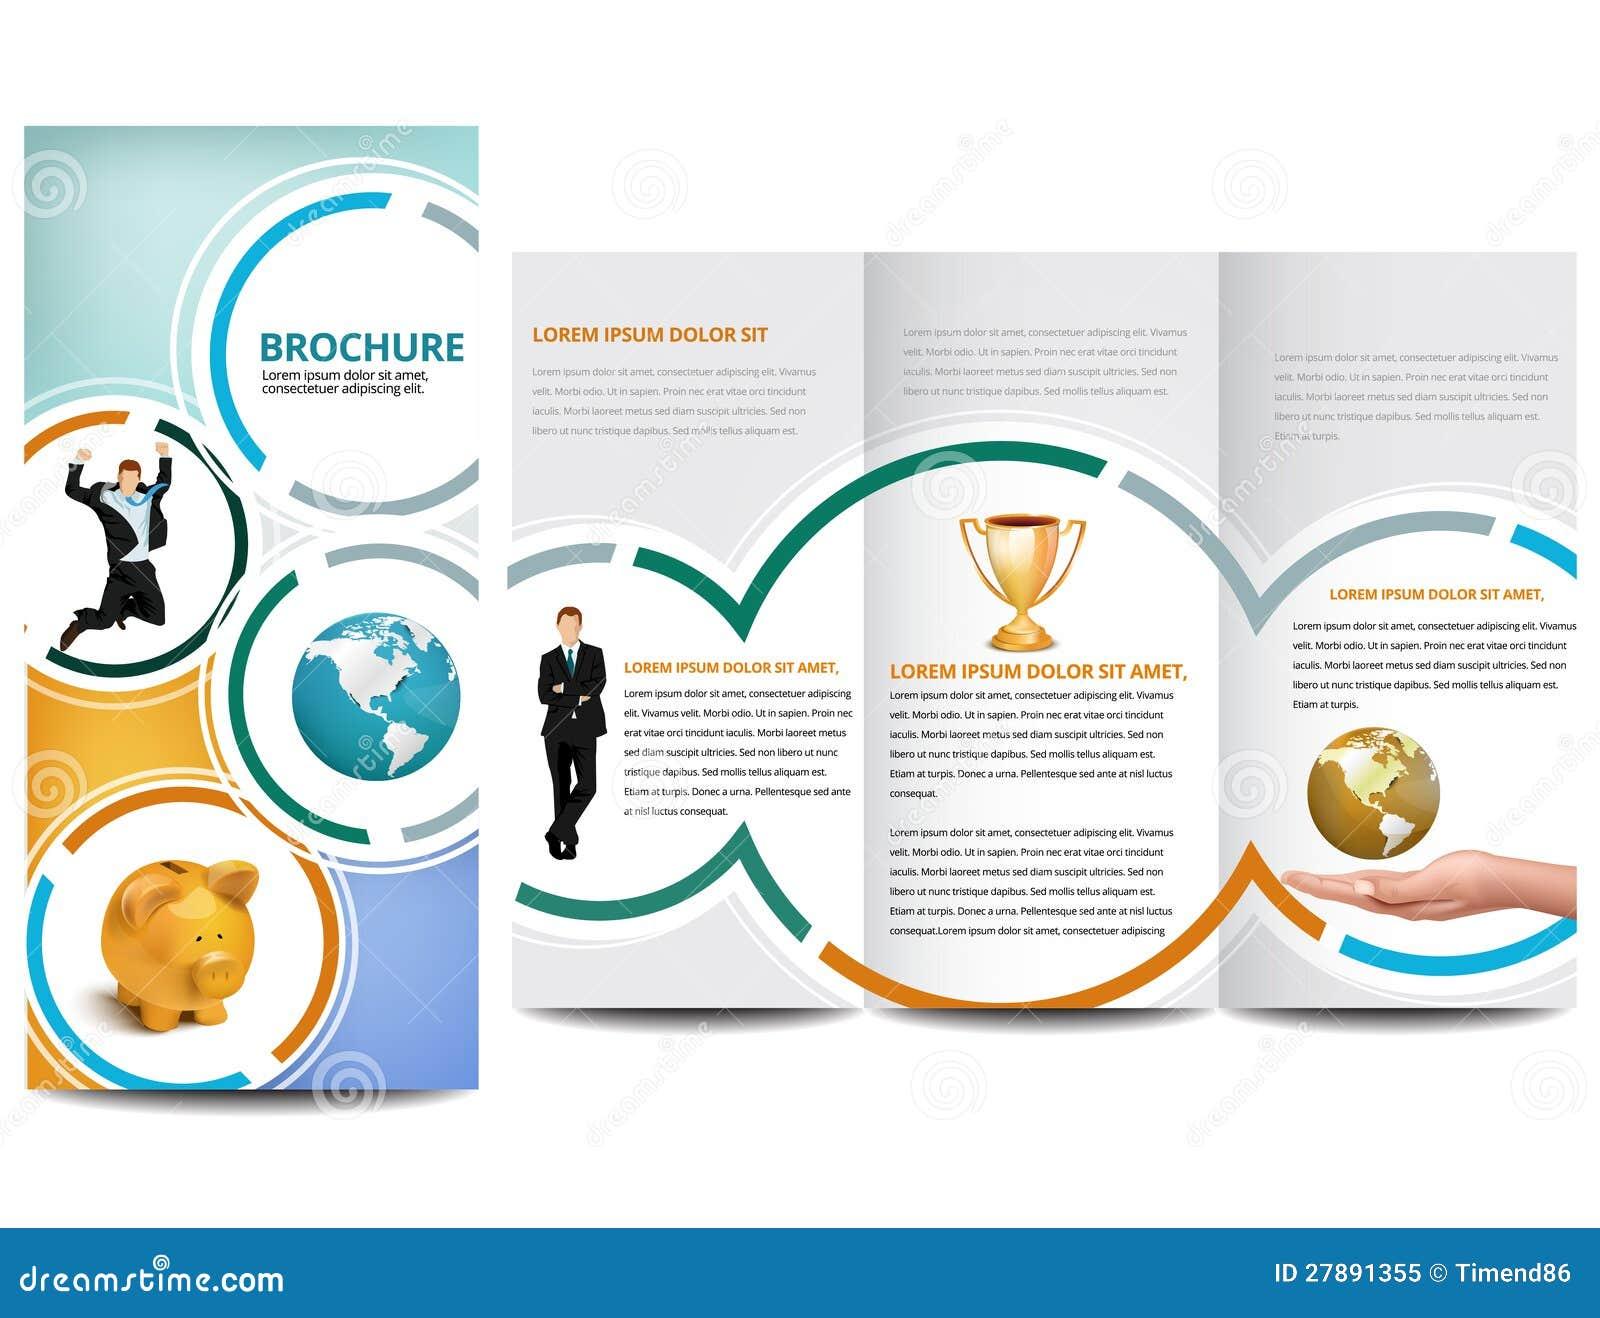 circle brochure template - circle brochure royalty free stock photo image 27891355